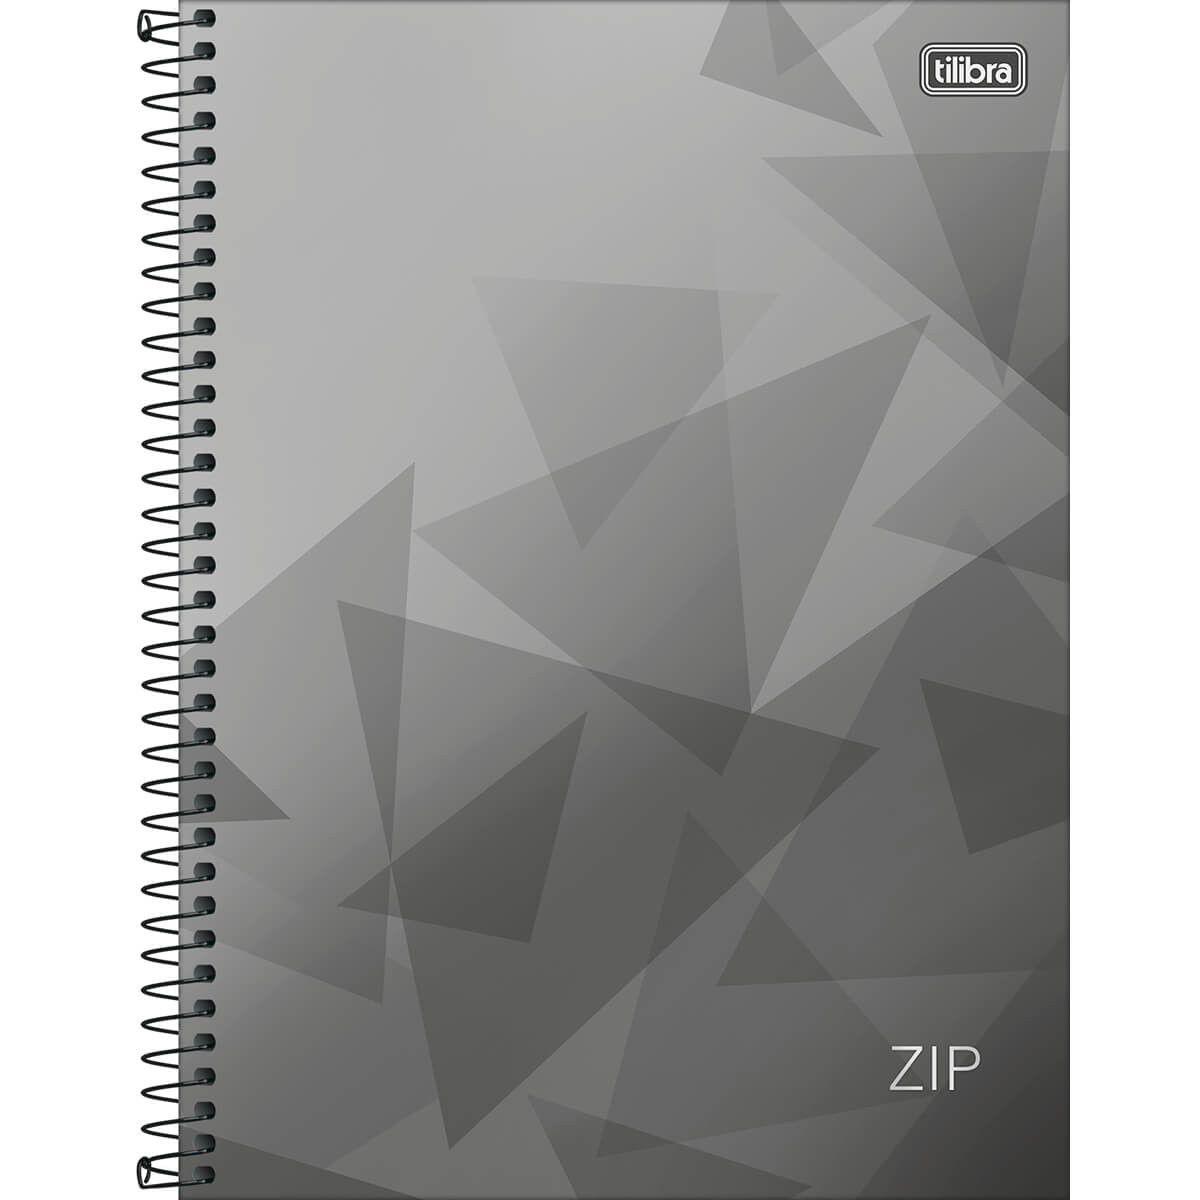 Caderno Tilibra Capa Dura Universitário 10M 200 Fls Zip 134473 27787